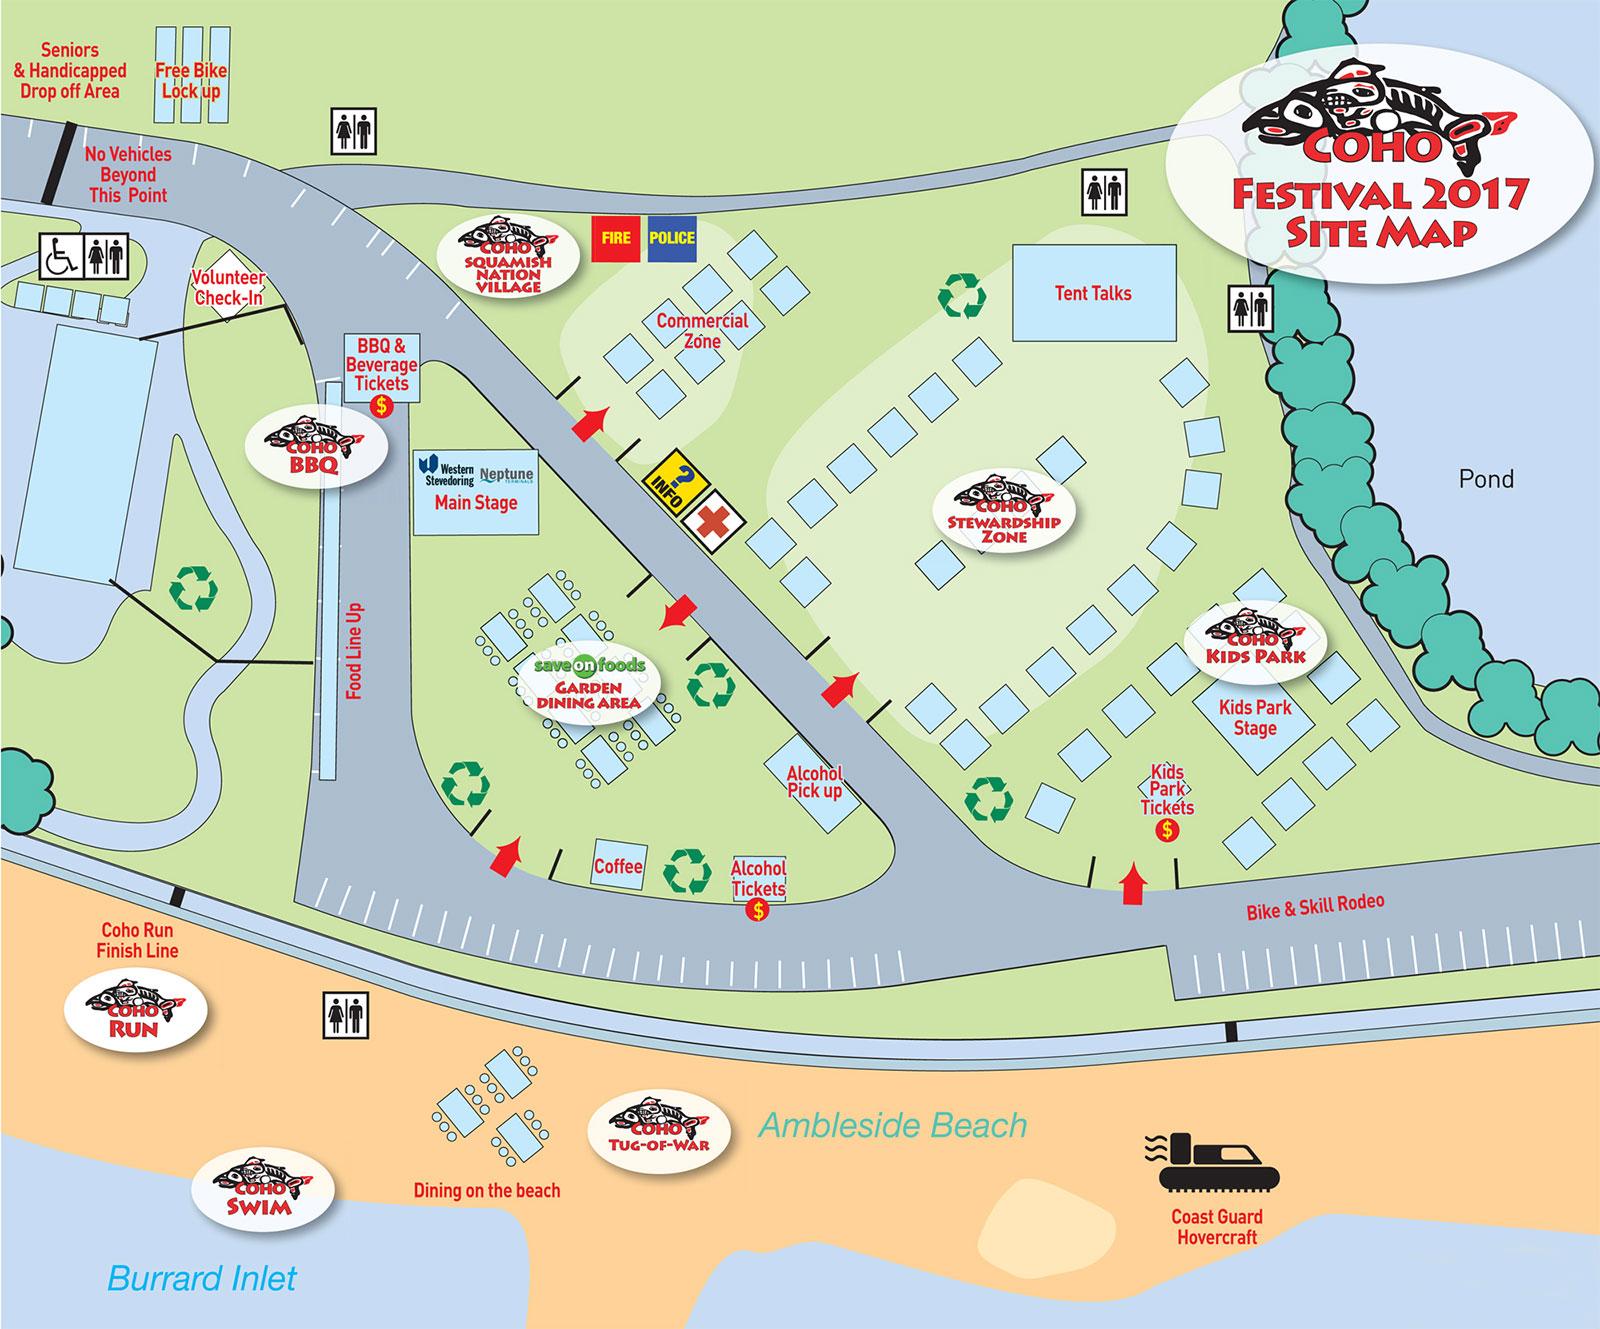 Coho Festival 2017 Map